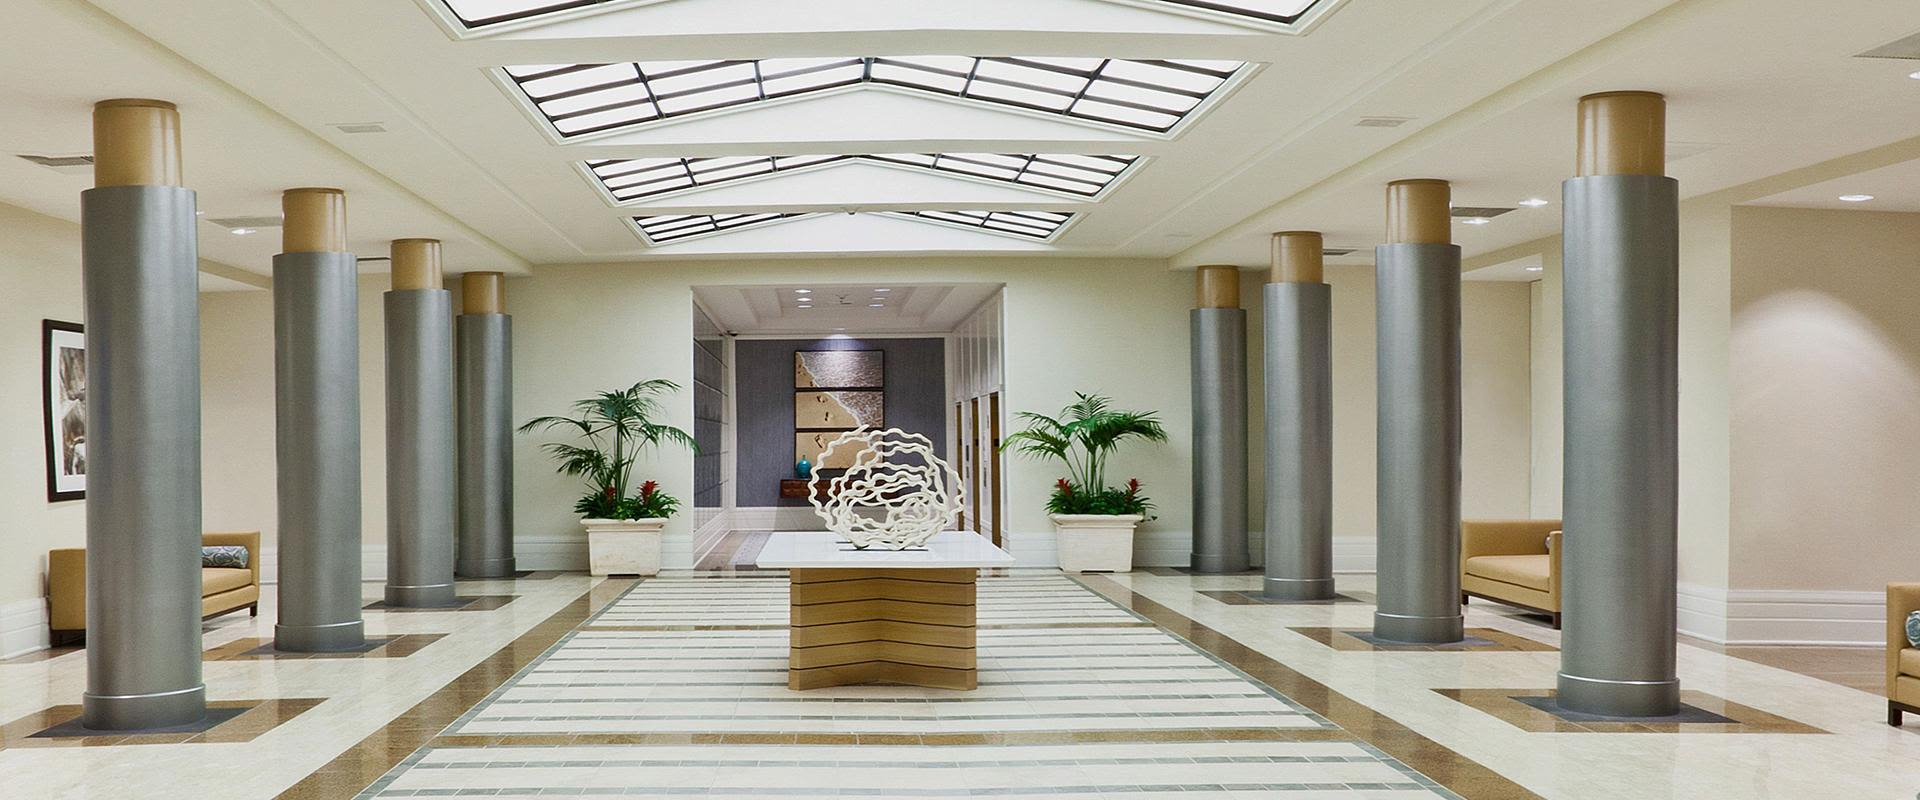 Redondo Beach Hotel Atrium